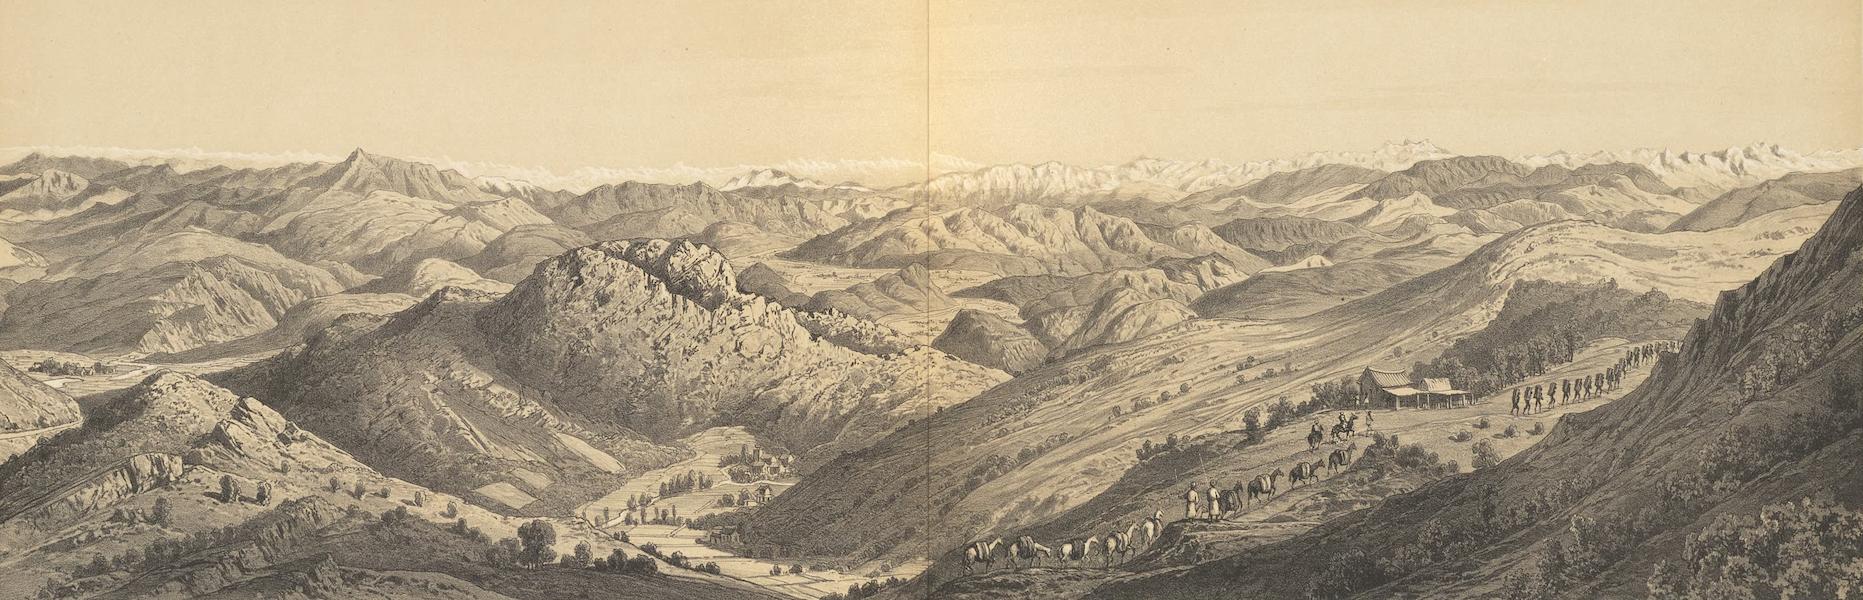 Voyage d'Exploration en Indo-Chine [Atlas-Vol. 1] - Panorama Pris Entre Mekong Kou et Houey-Ly Tcheaou (1873)